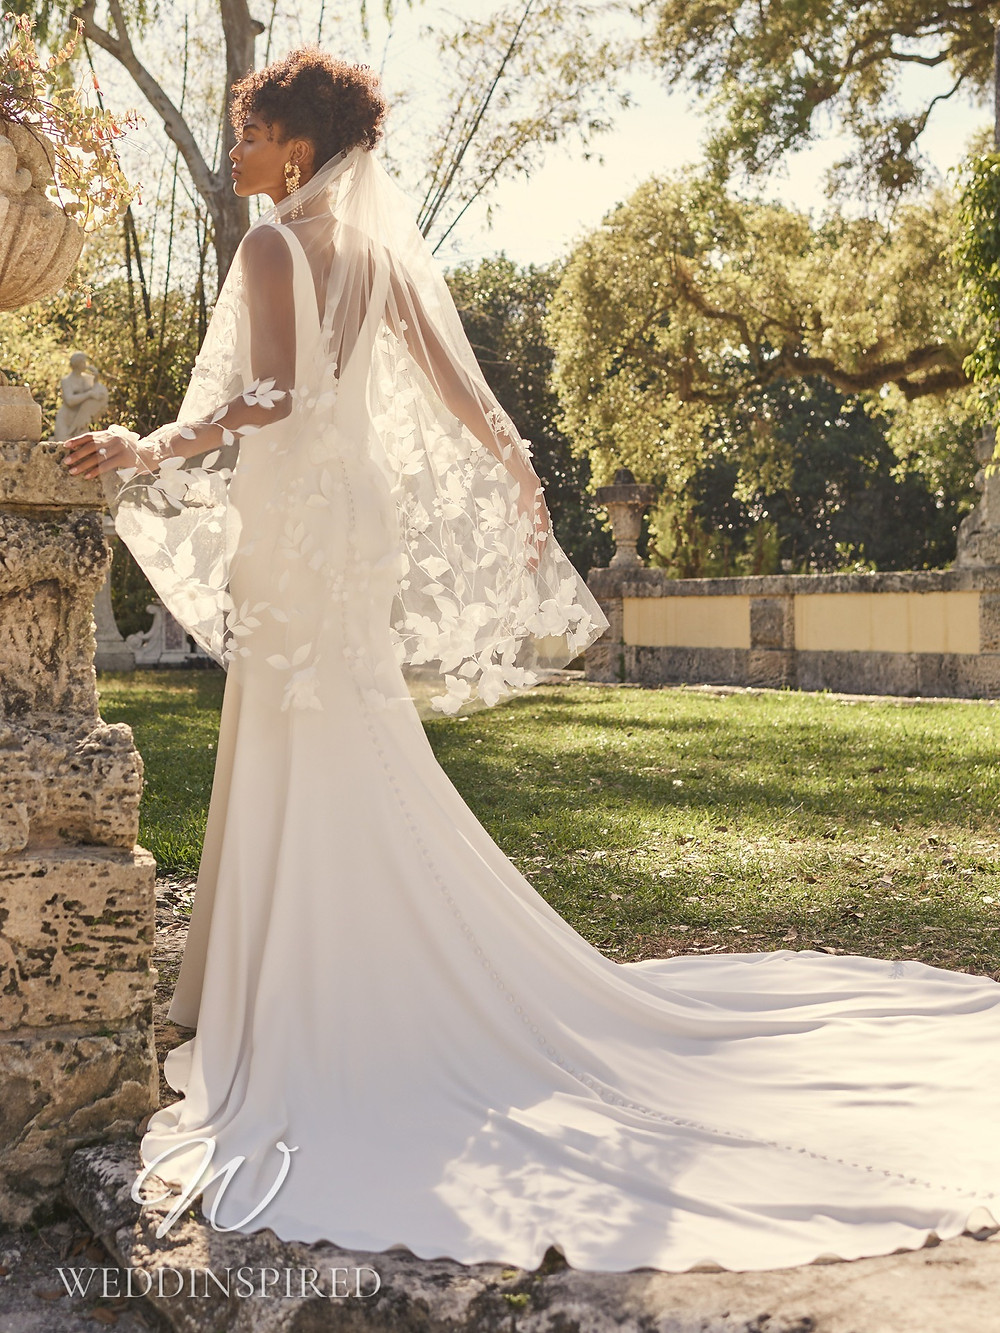 A Maggie Sottero 2021 simple satin mermaid wedding dress